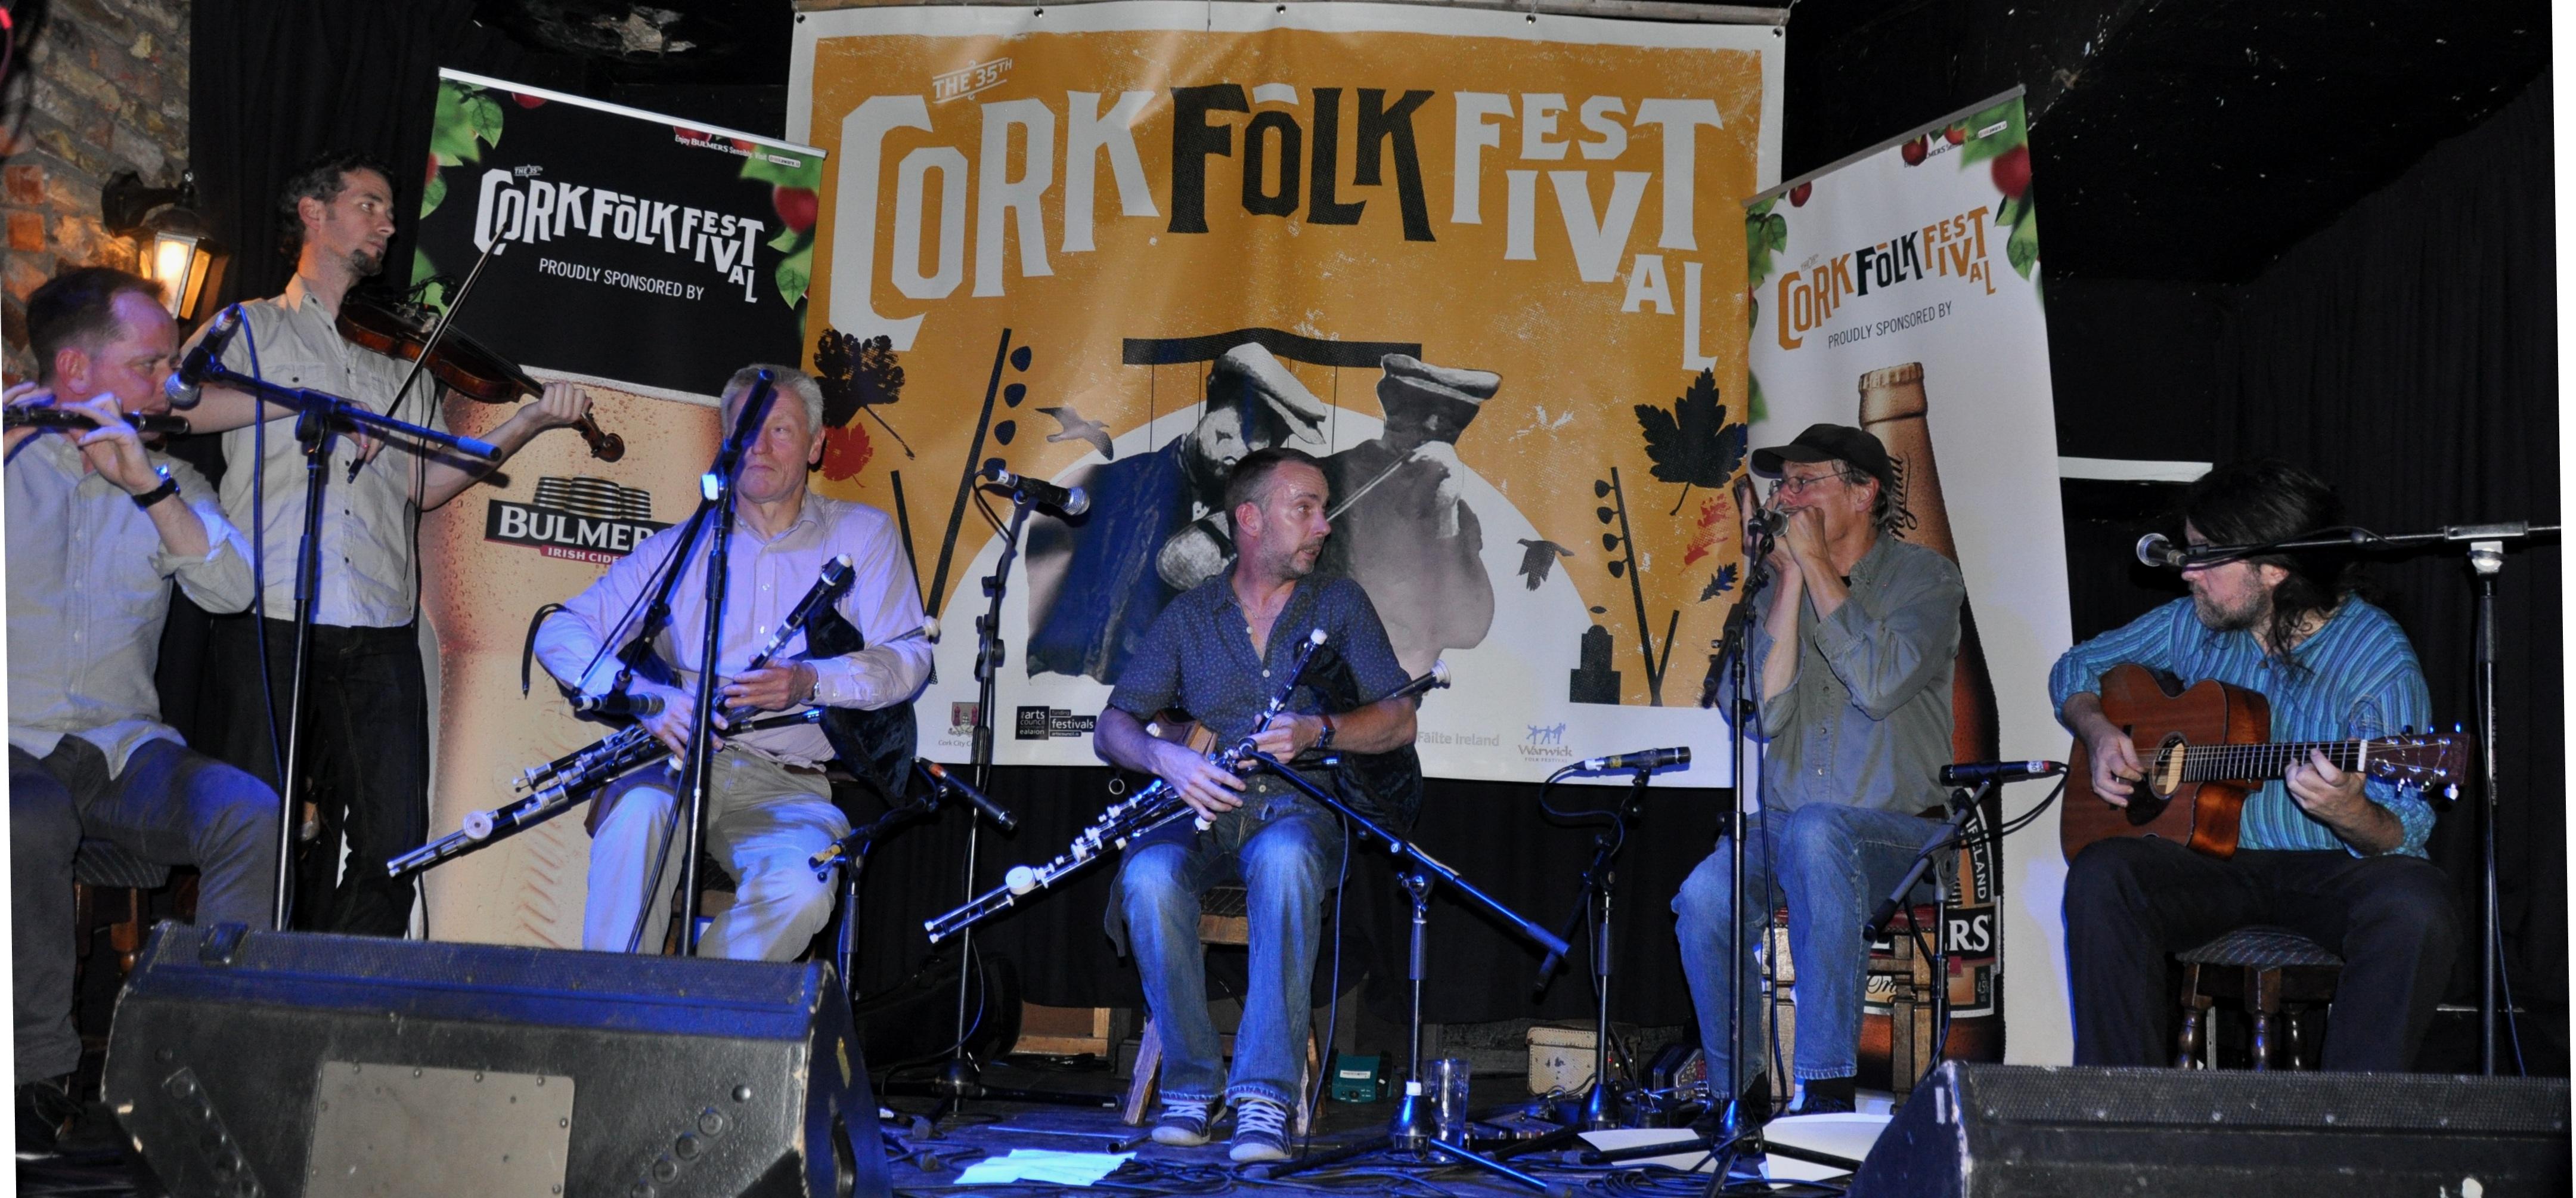 New Road with Mick O Brien - Cork Folk Festival 2014